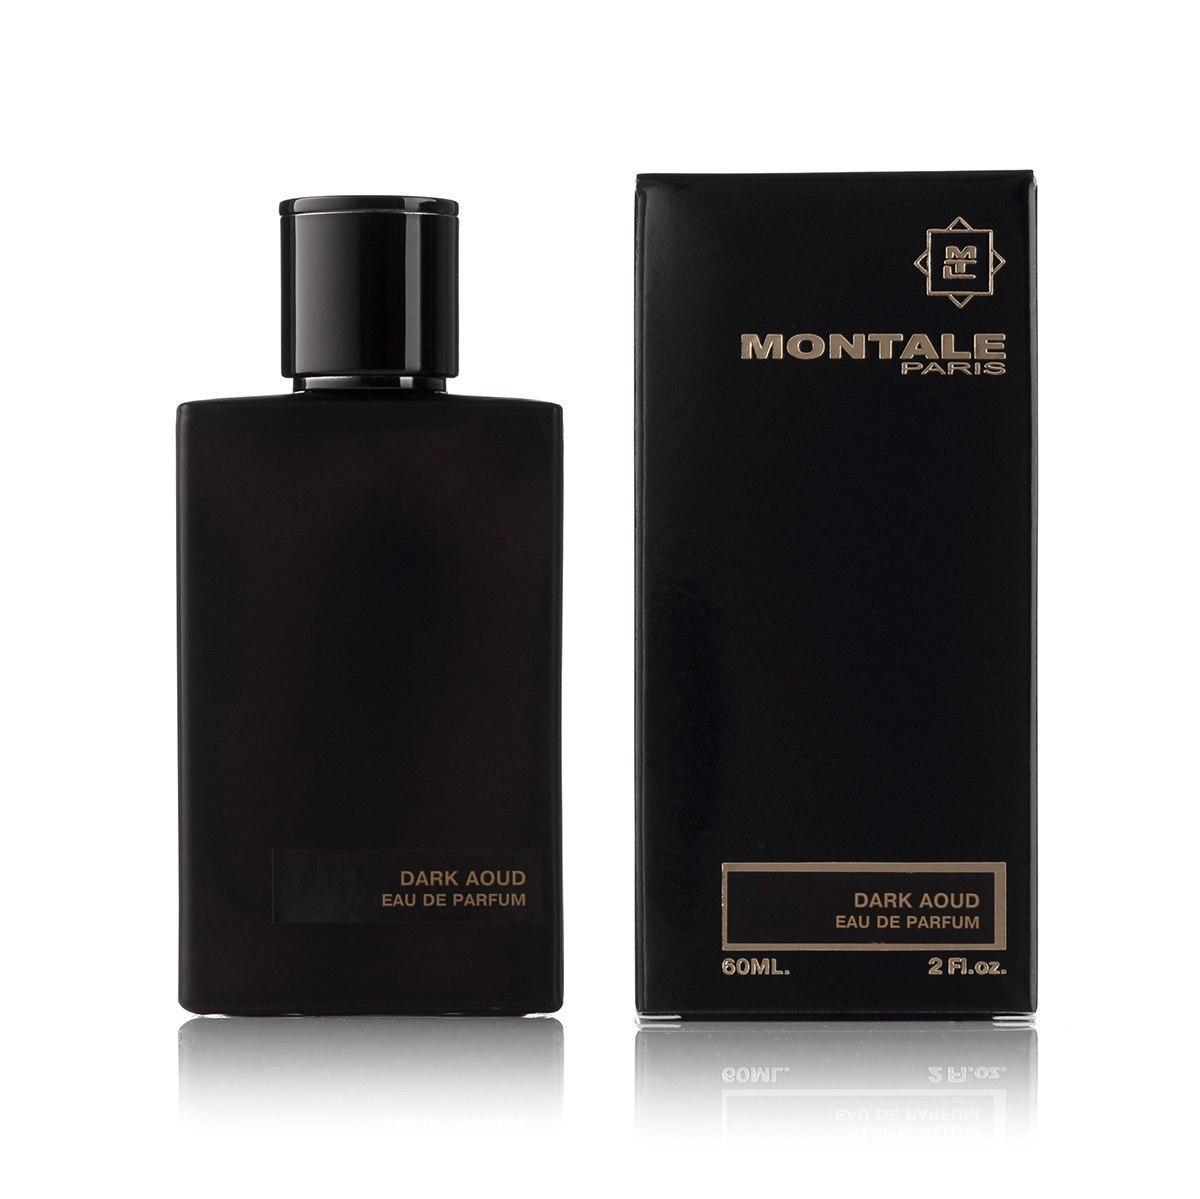 Мини - парфюм  Montale Dark Aoud - Унисекс - 60 мл (M-10)